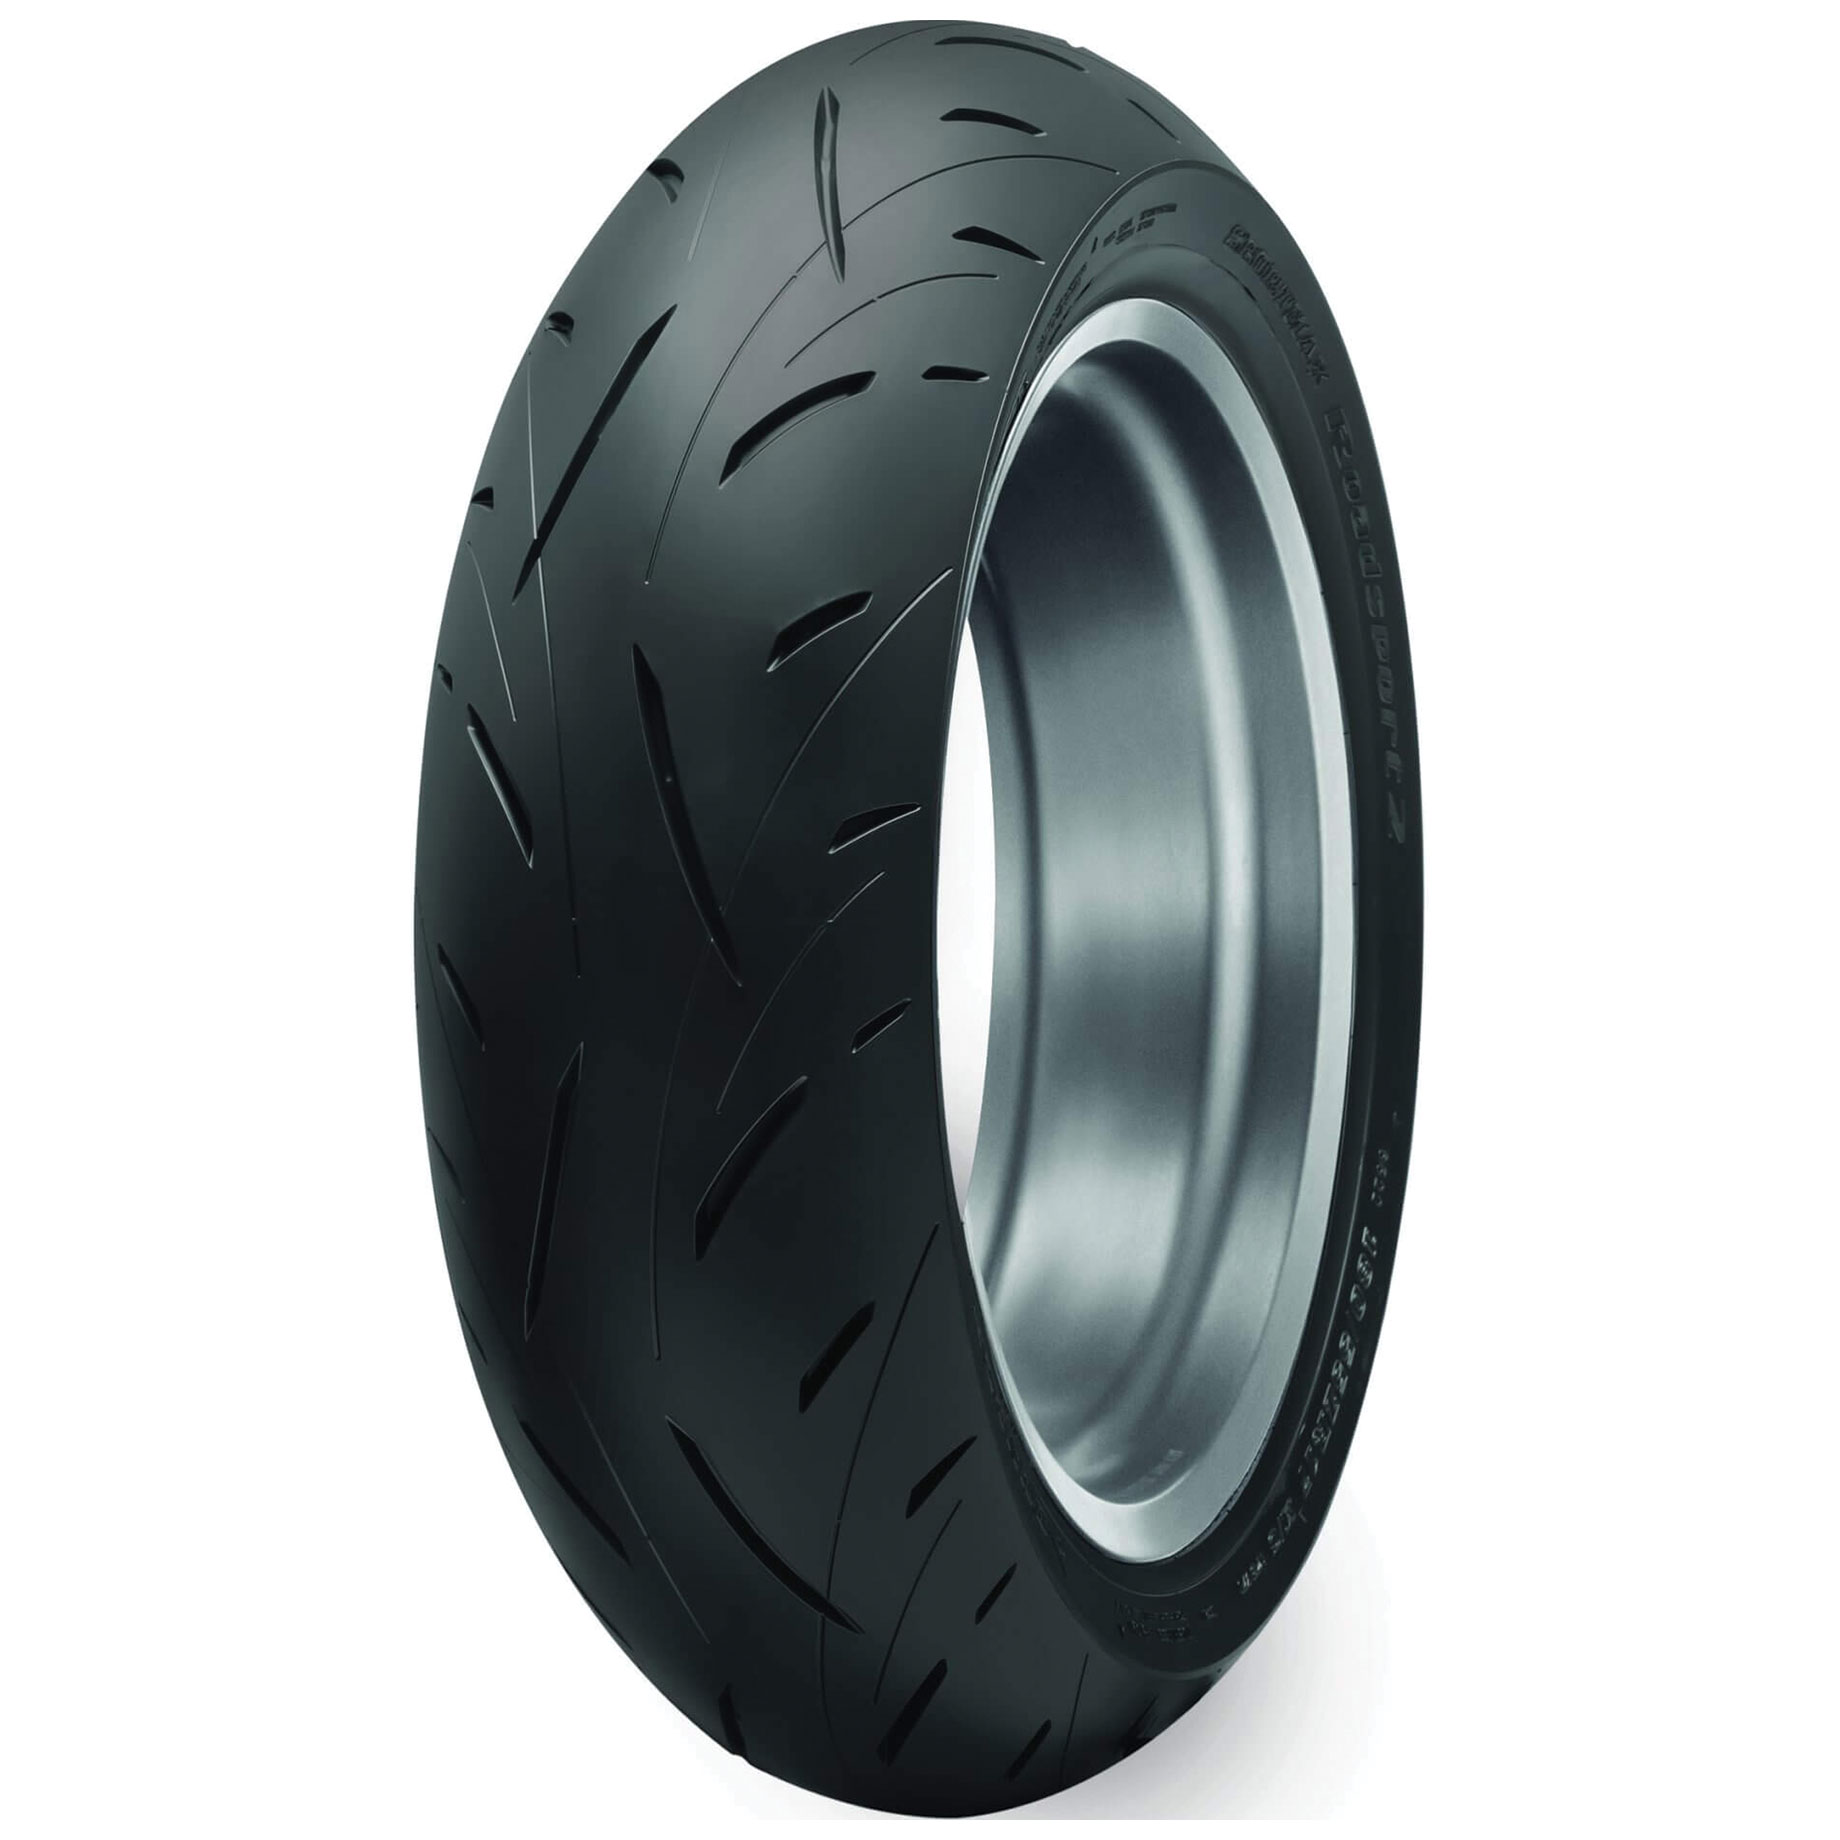 Dunlop Roadsport 2 200/55ZR17 Rear Tire